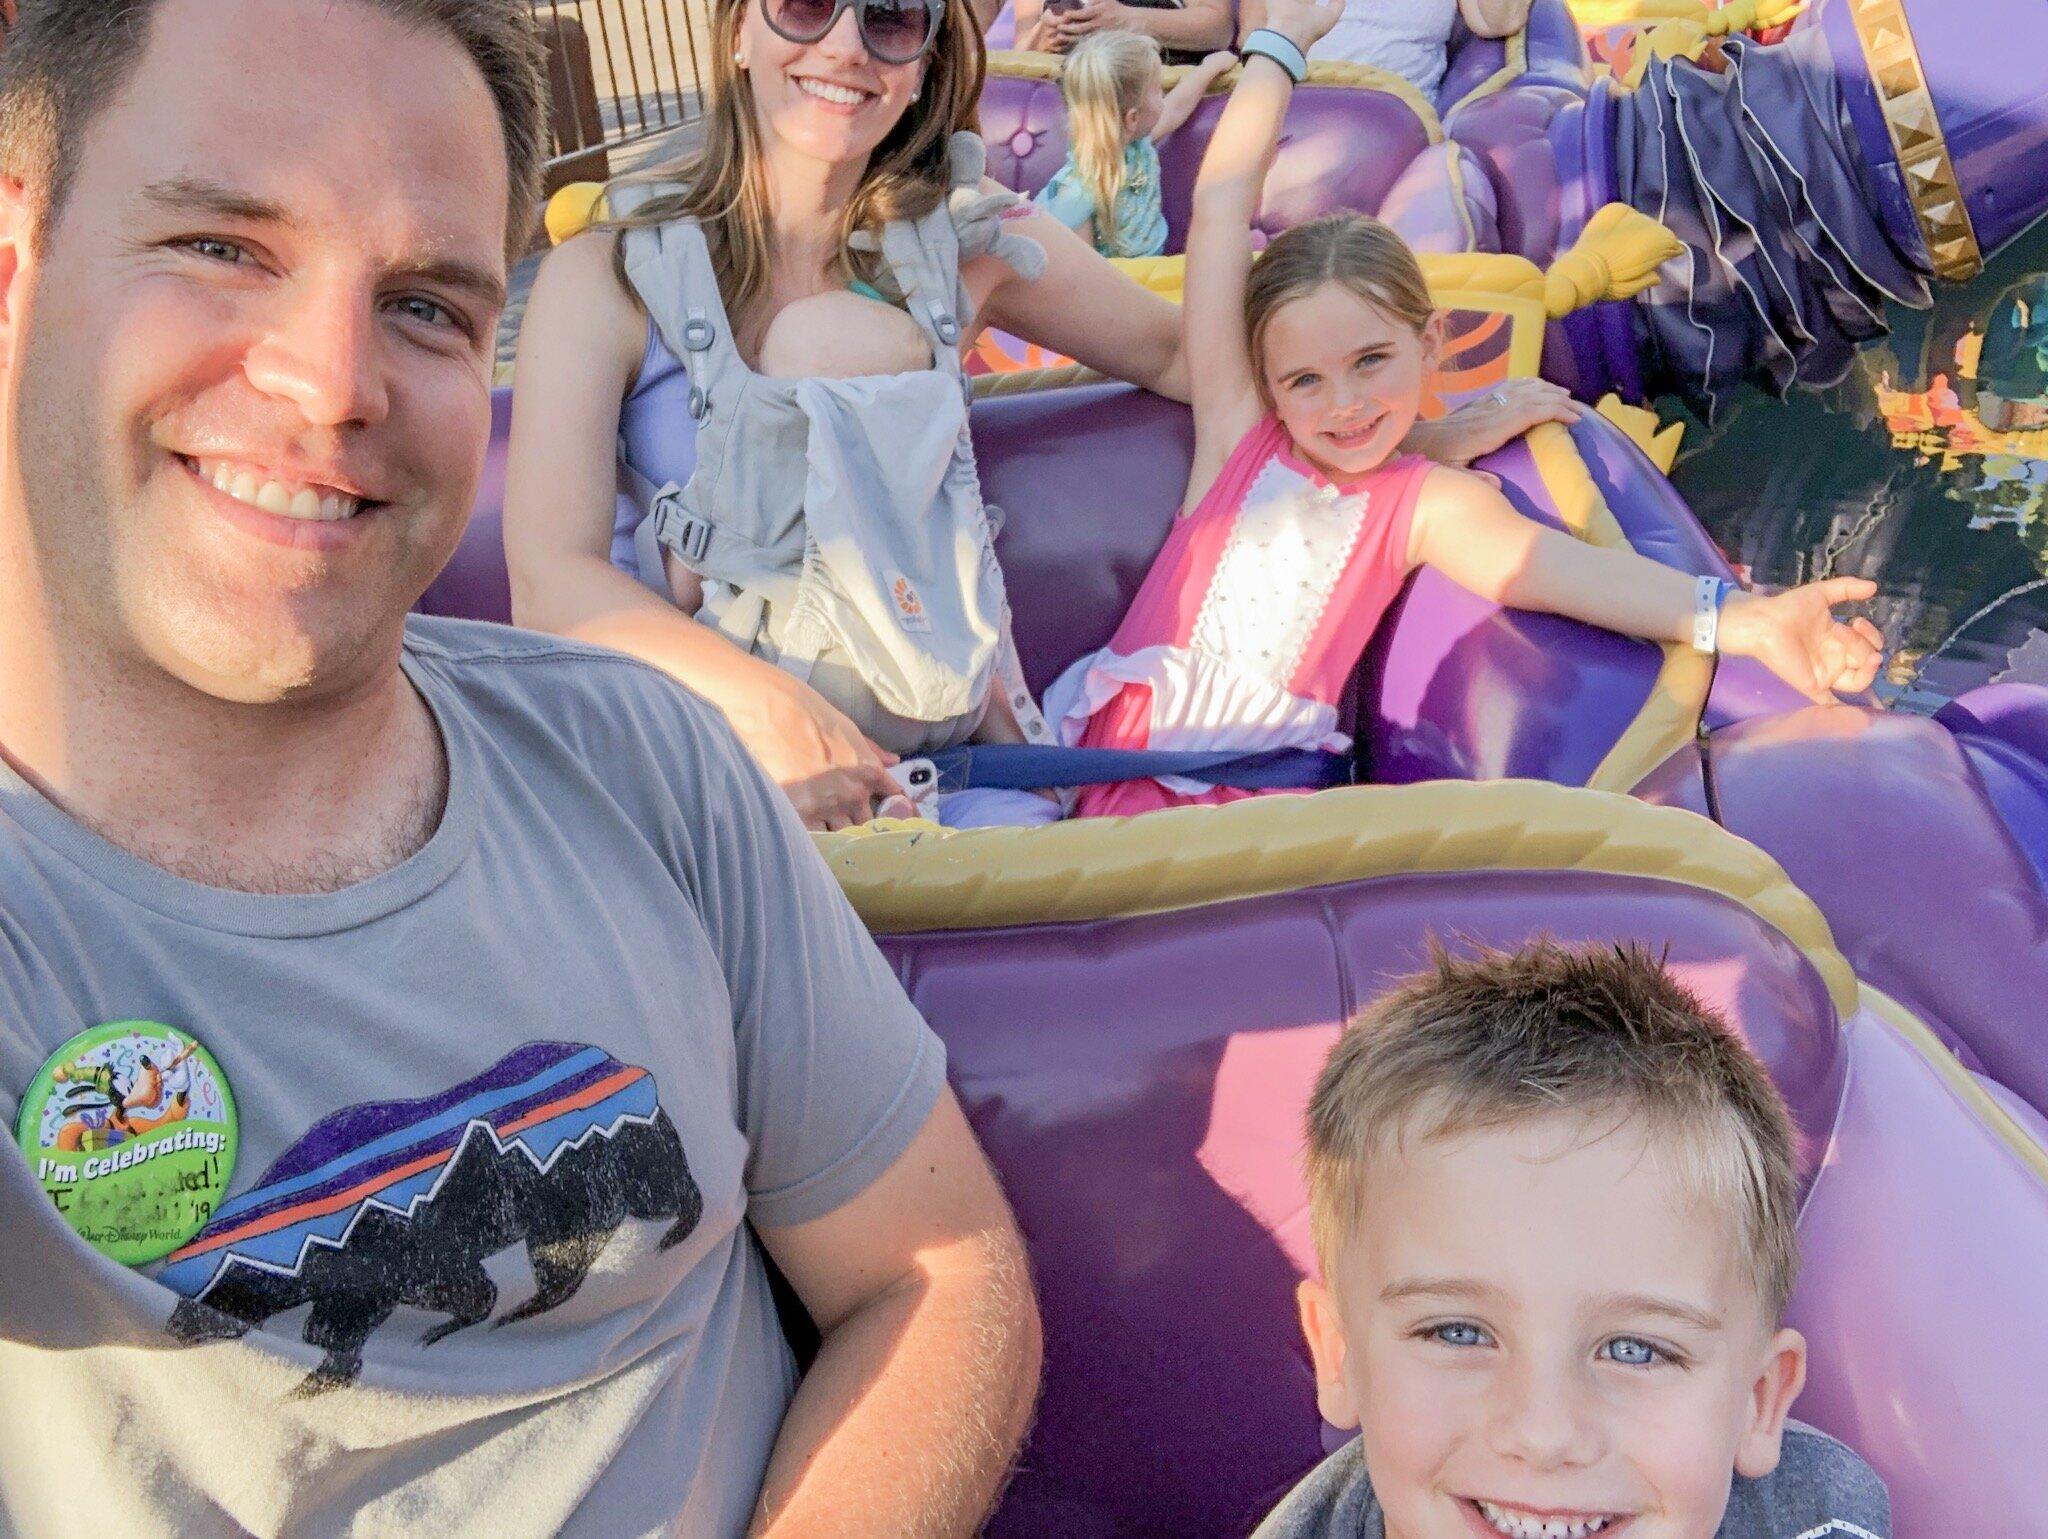 Family of 5 riding on Aladdin's Magic Carpets at Magic Kingdom Disney World.